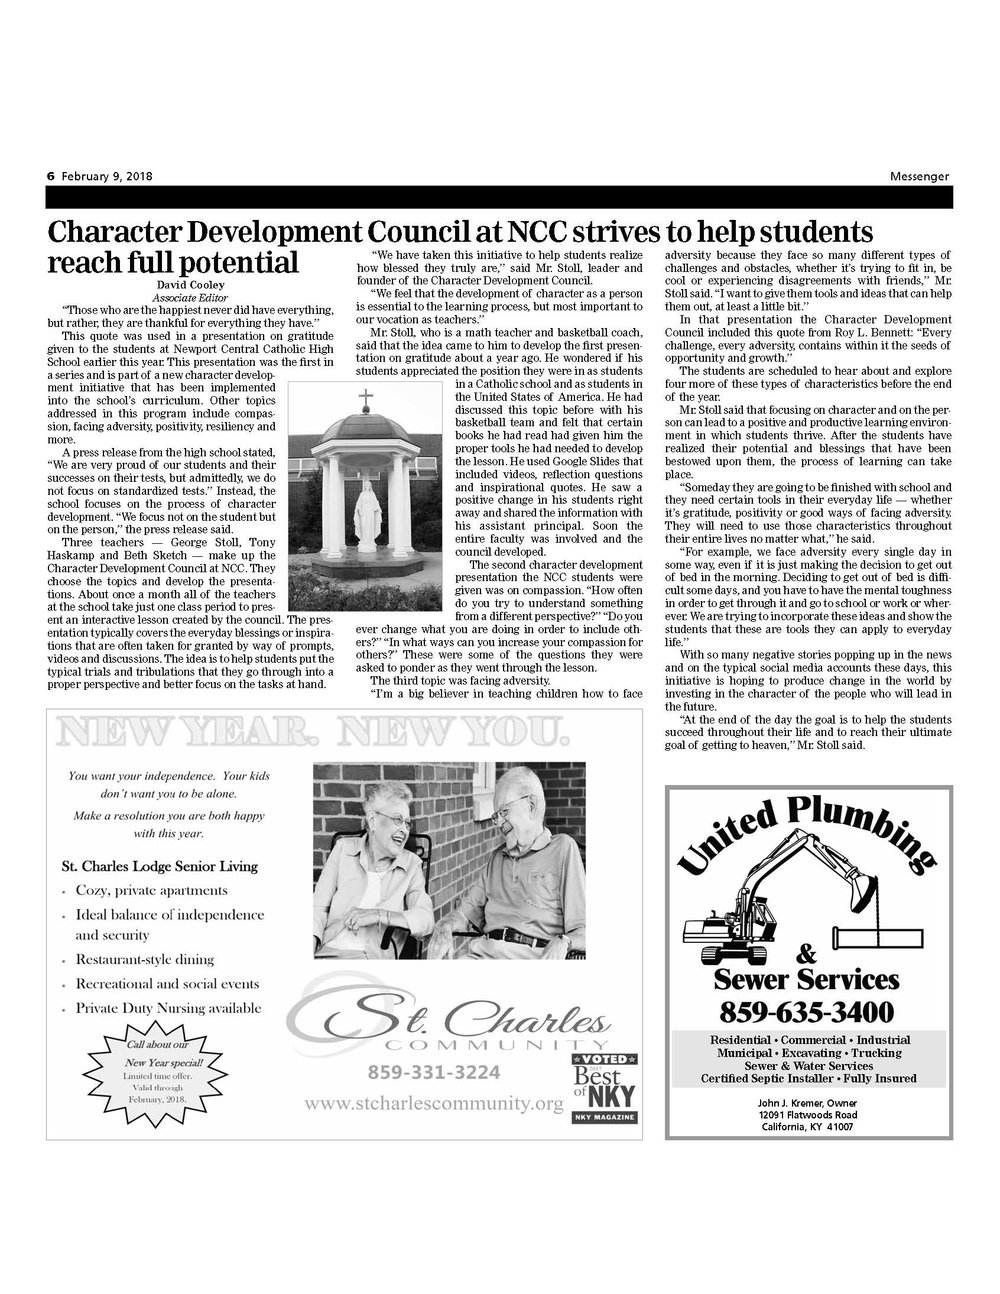 Article NCCCharacterDevelopment.jpg